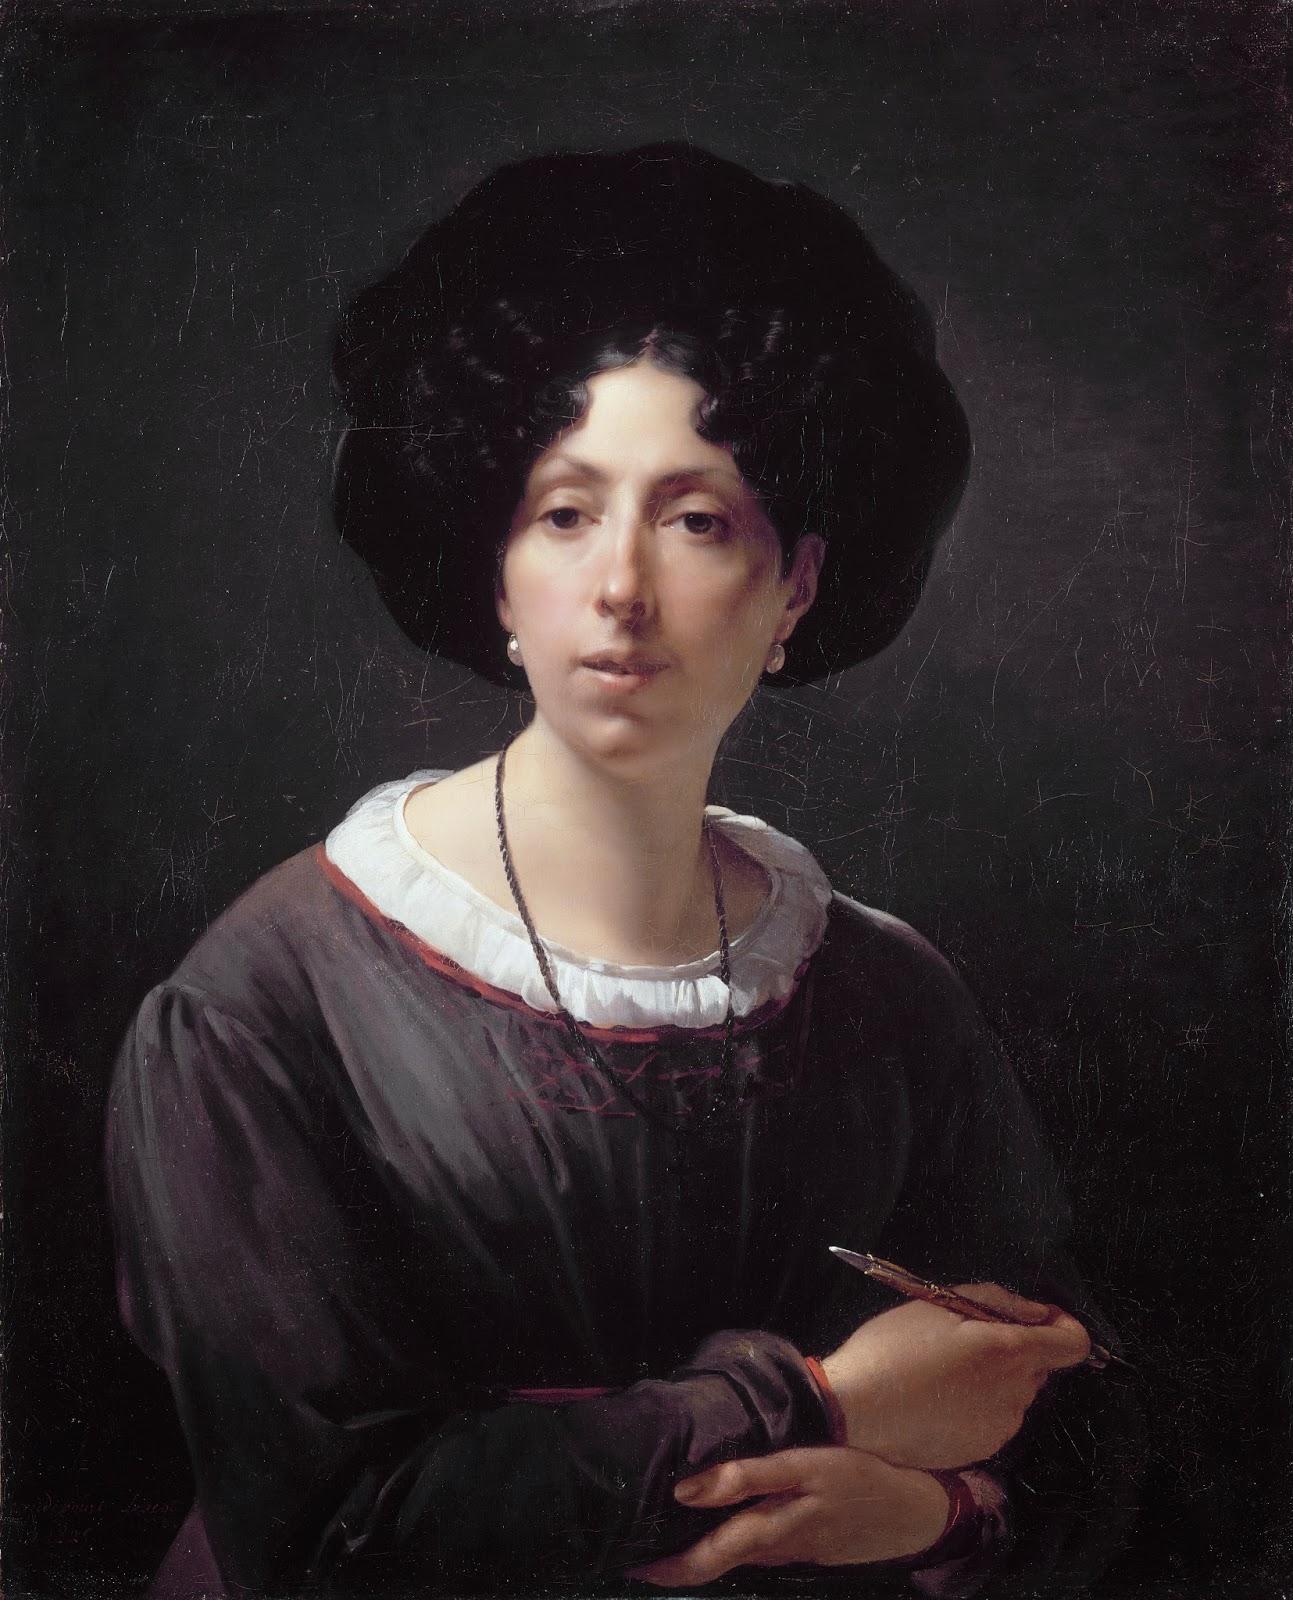 Autoportrait (1800), Hortense Haudebourt-Lescot